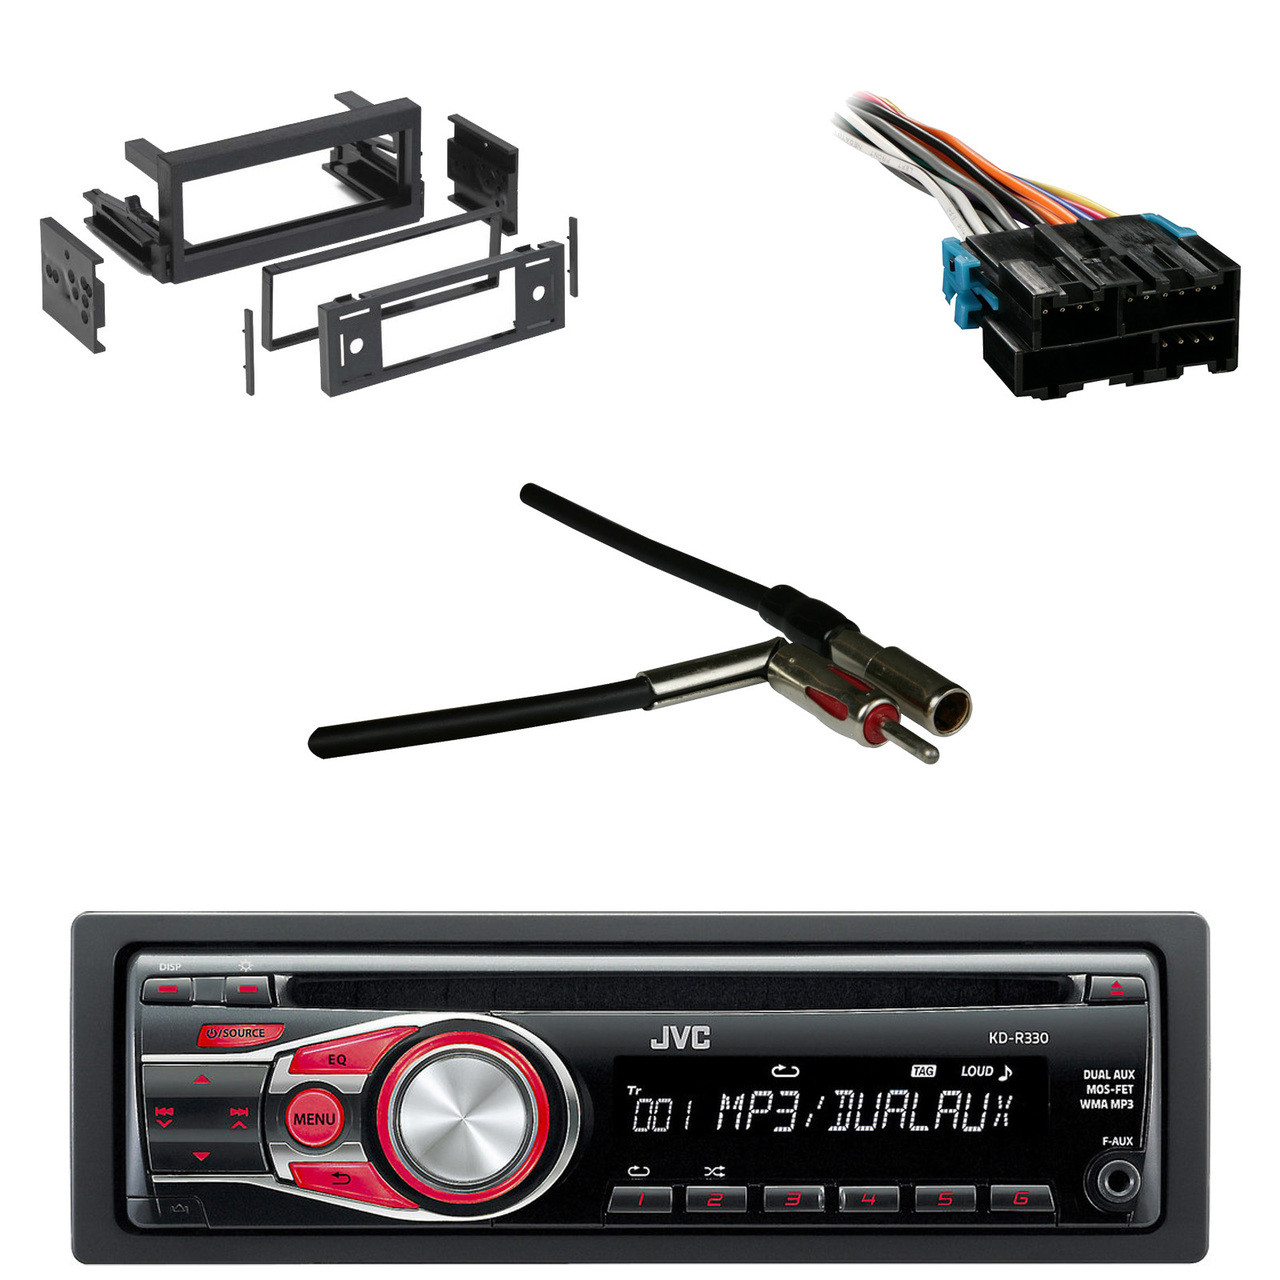 [SCHEMATICS_44OR]  JVC KDR330 CD AUX Car Radio, Antenn Adapter, GM Wire Harness, GM Dash  Install Kit - Road Entertainment | Jvc Wire Harness Chevy |  | Road Entertainment